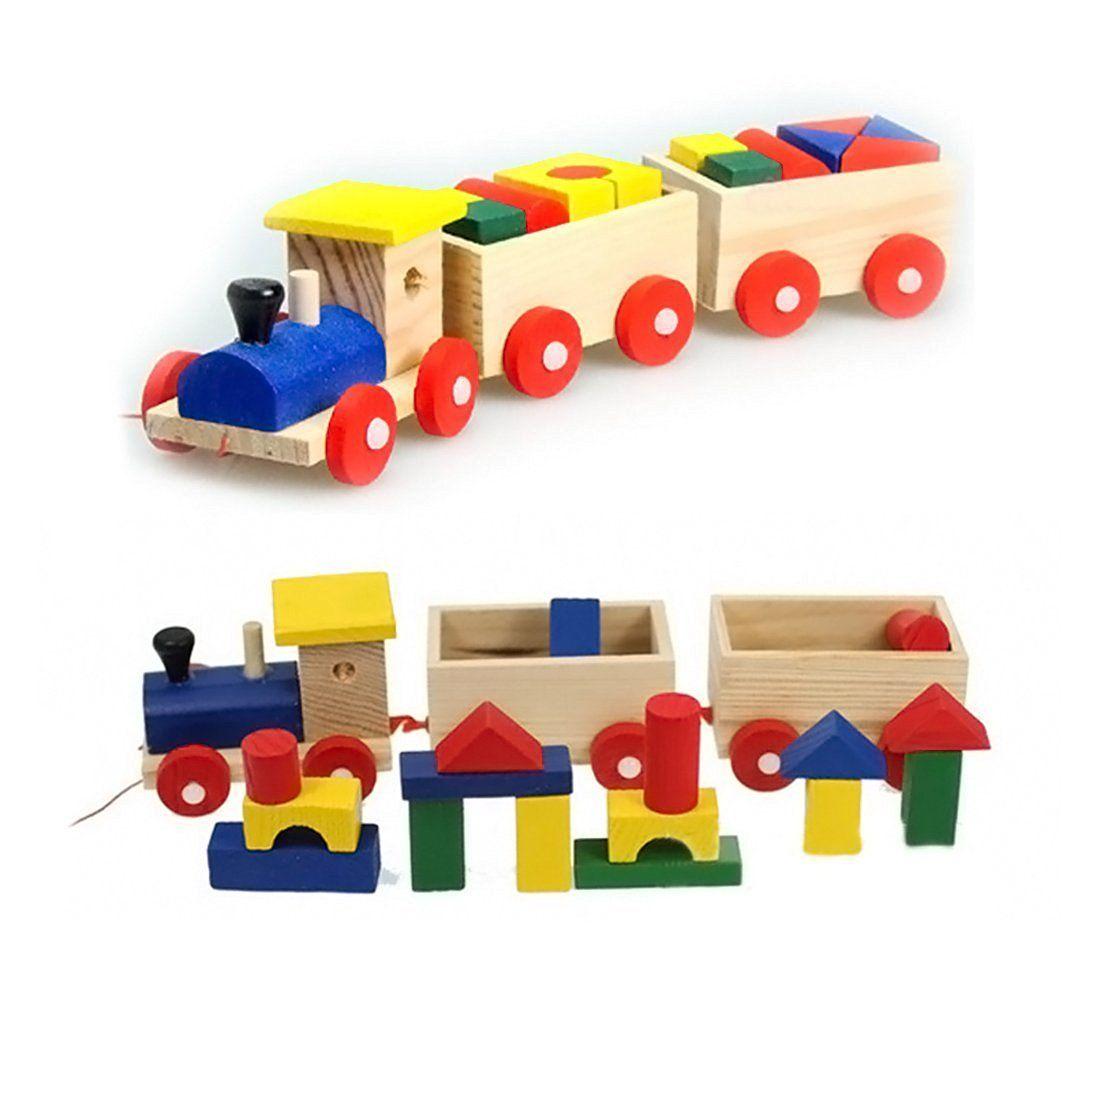 finer shop tres seccin a lo largo traccin trenes con bloques construccin para nios beb juguetes